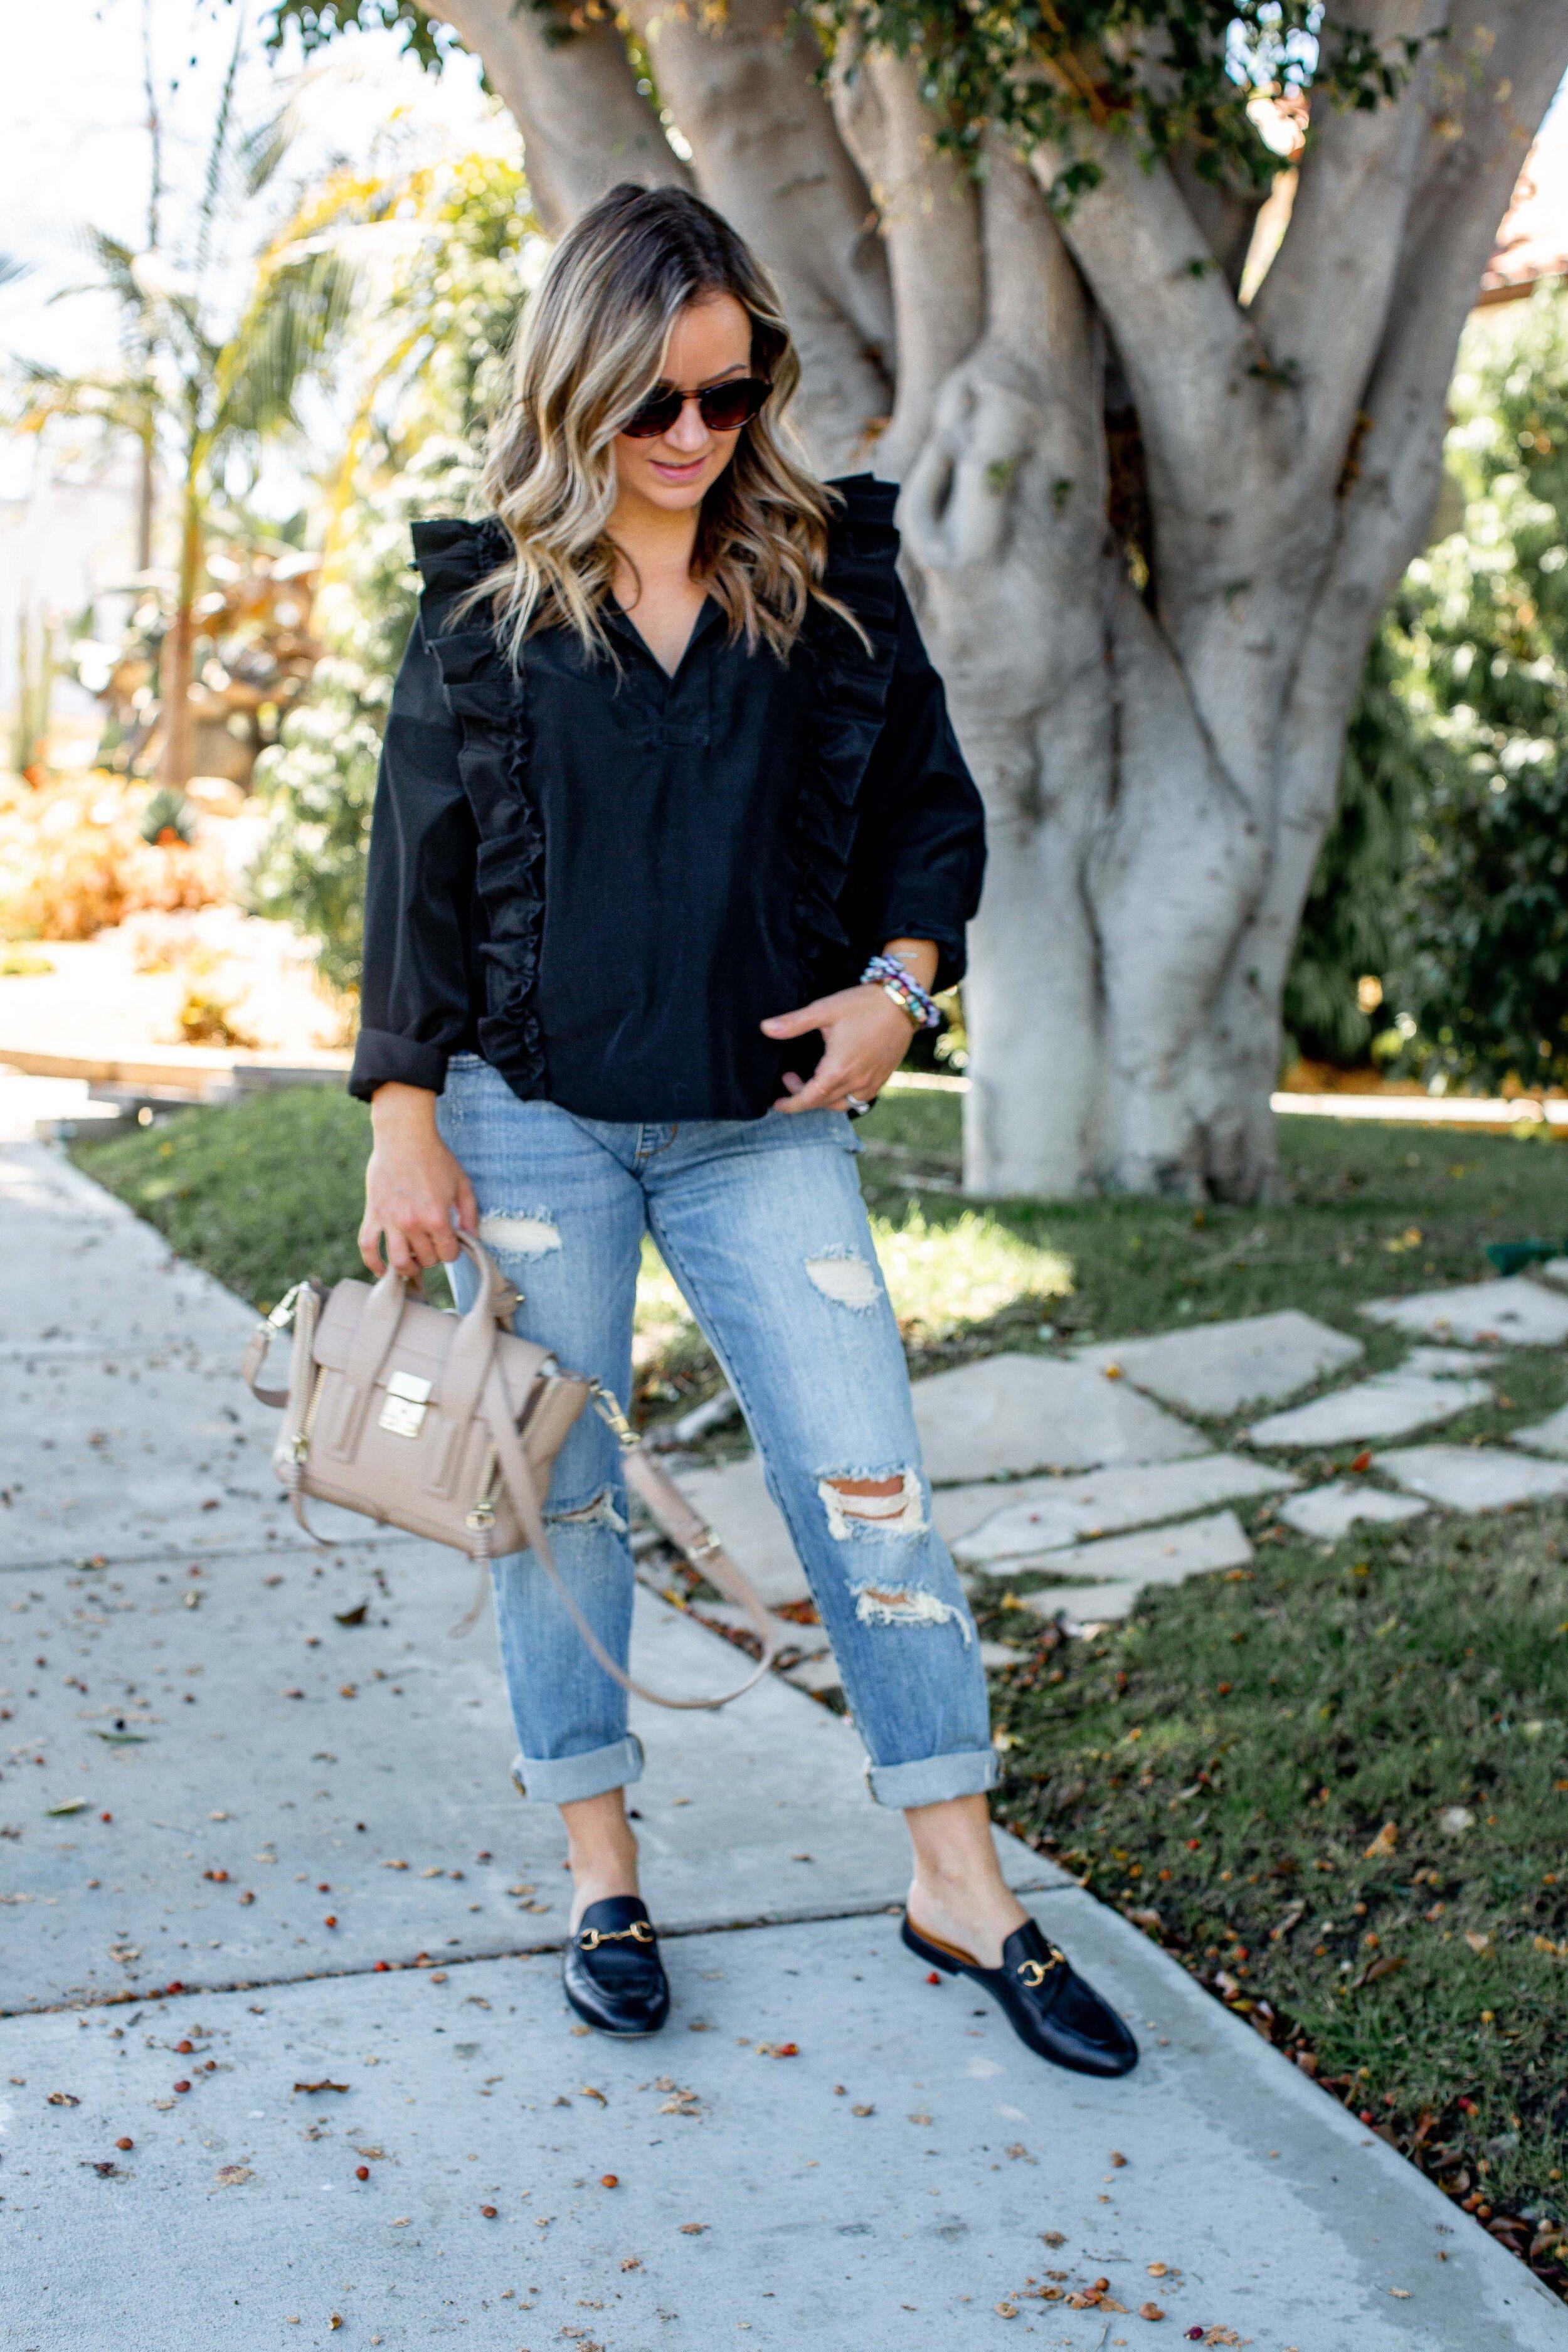 fizz-fade-bf-maternity-jeans-8.jpg